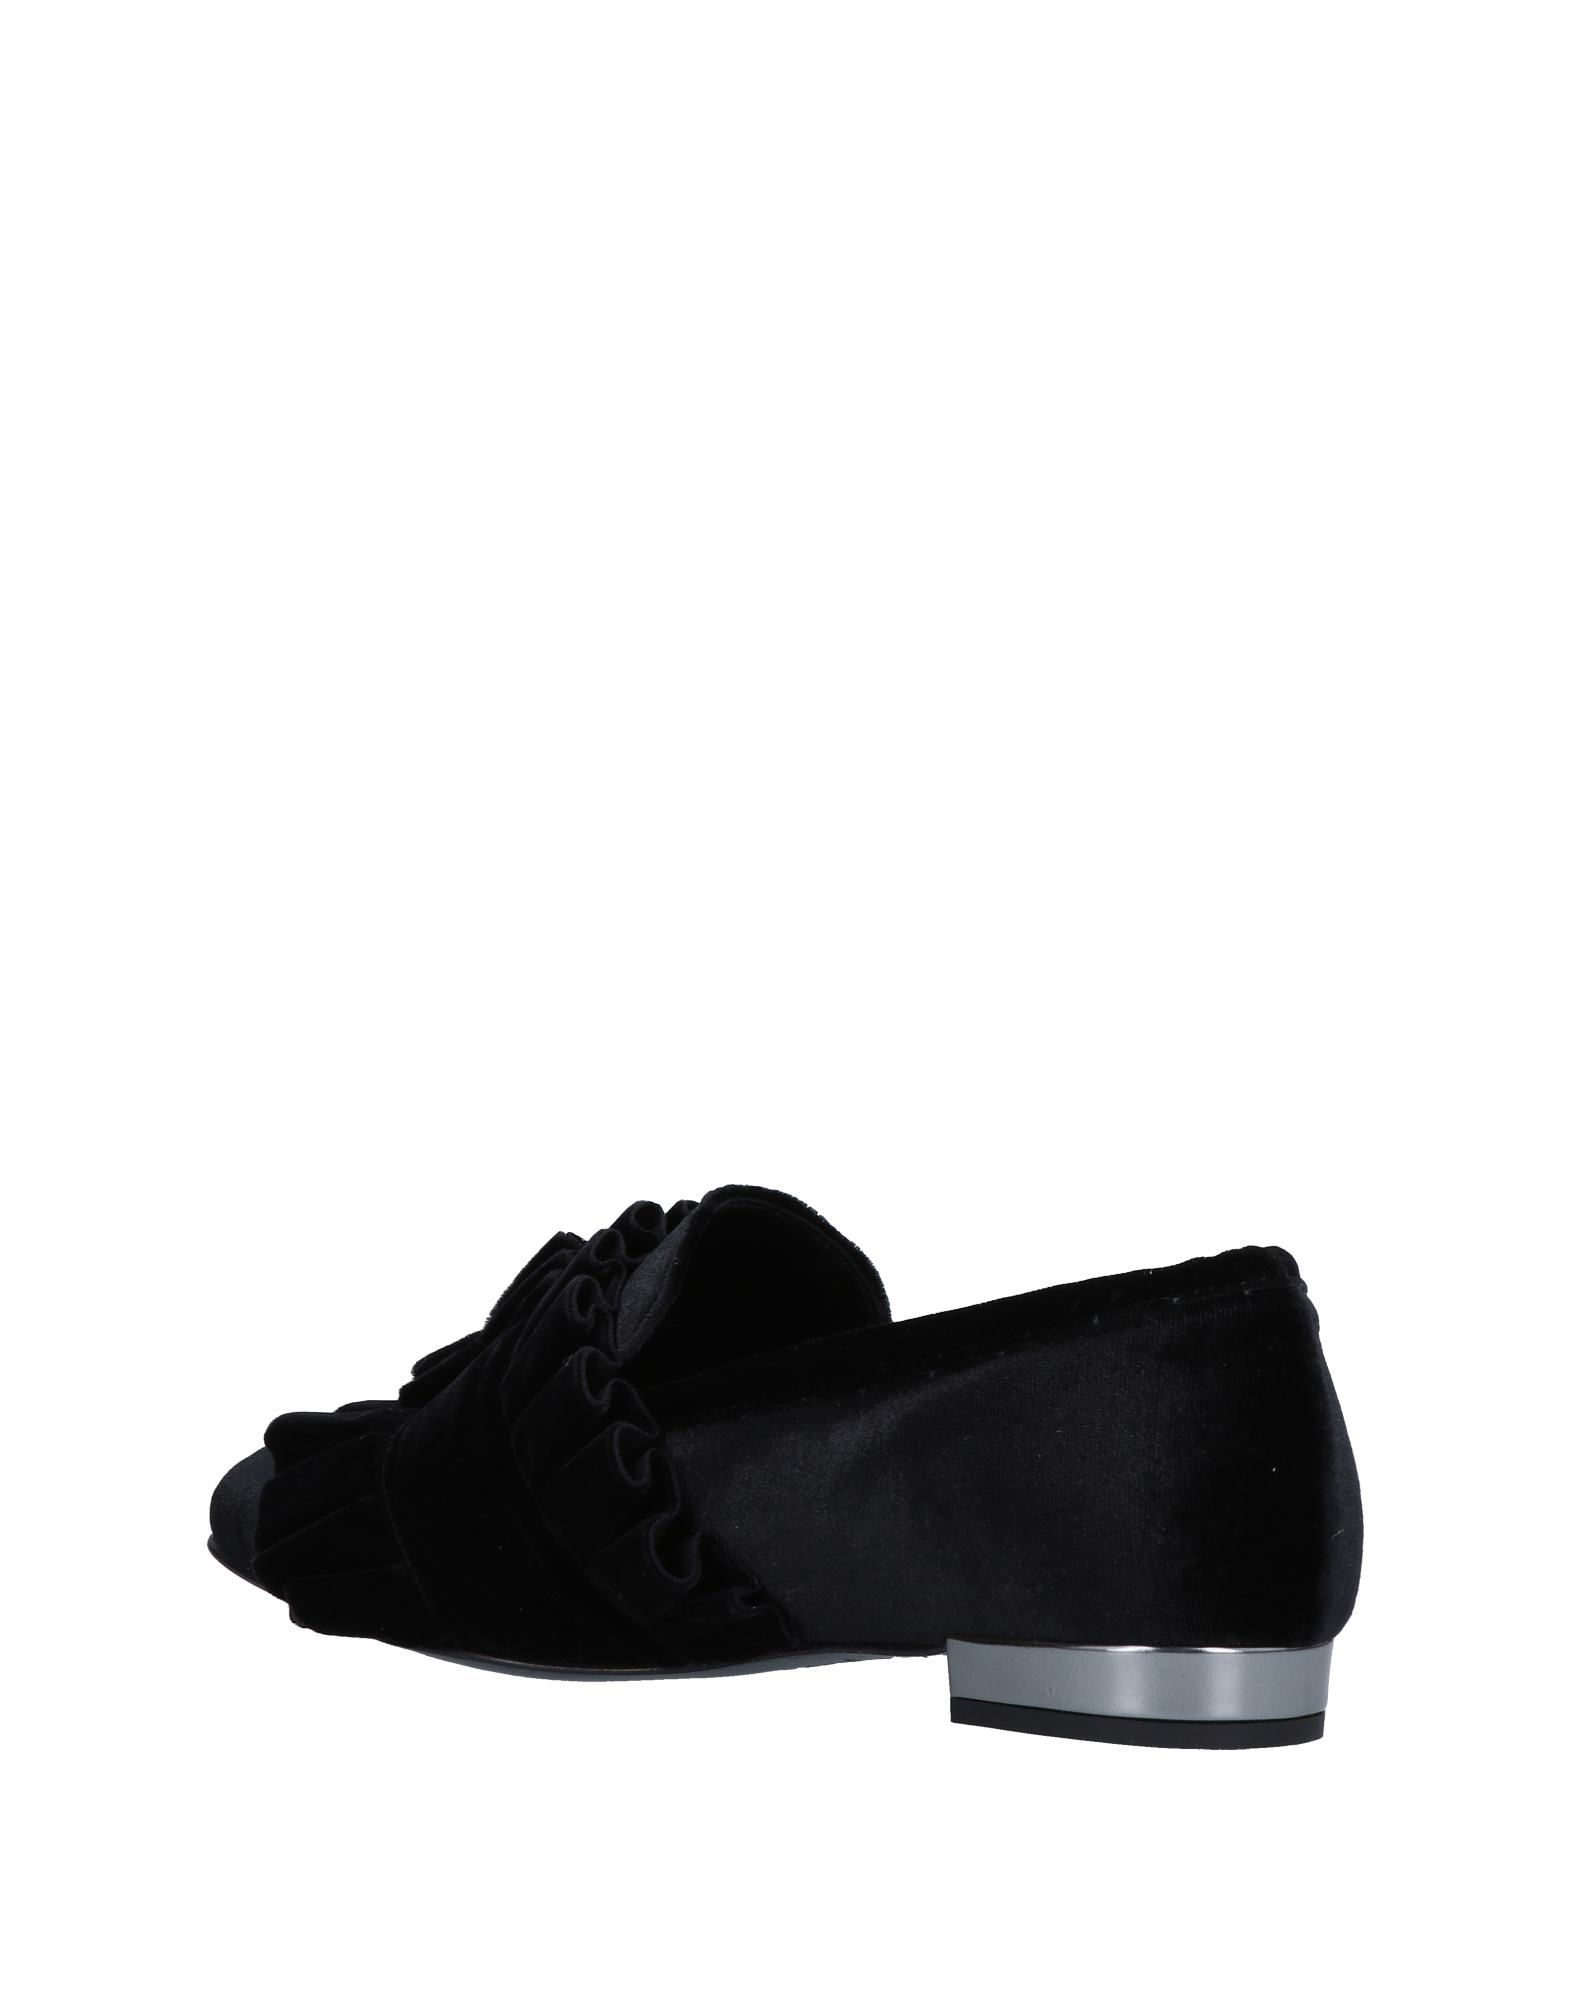 Stilvolle billige Schuhe Tipe  E Tacchi Mokassins Damen  Tipe 11520878RL cca964